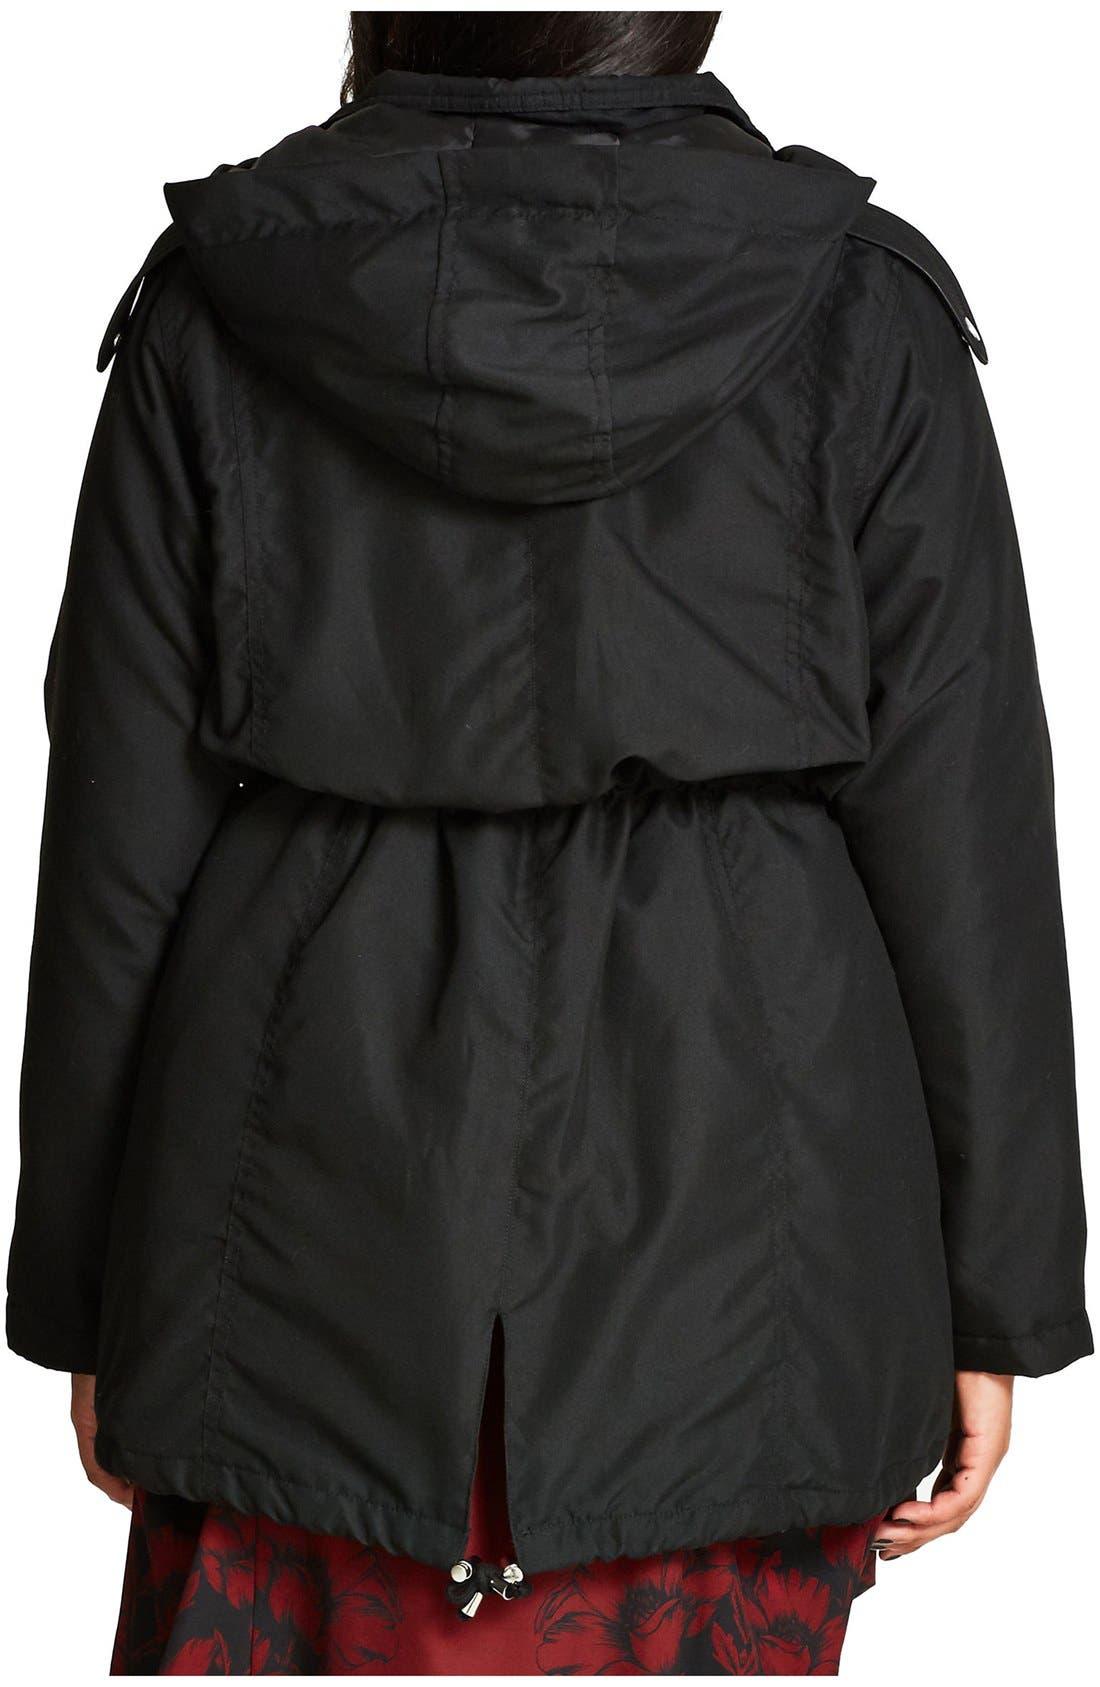 Alternate Image 2  - City Chic 'London Look' Faux Fur Trim Hooded Parka (Plus Size)